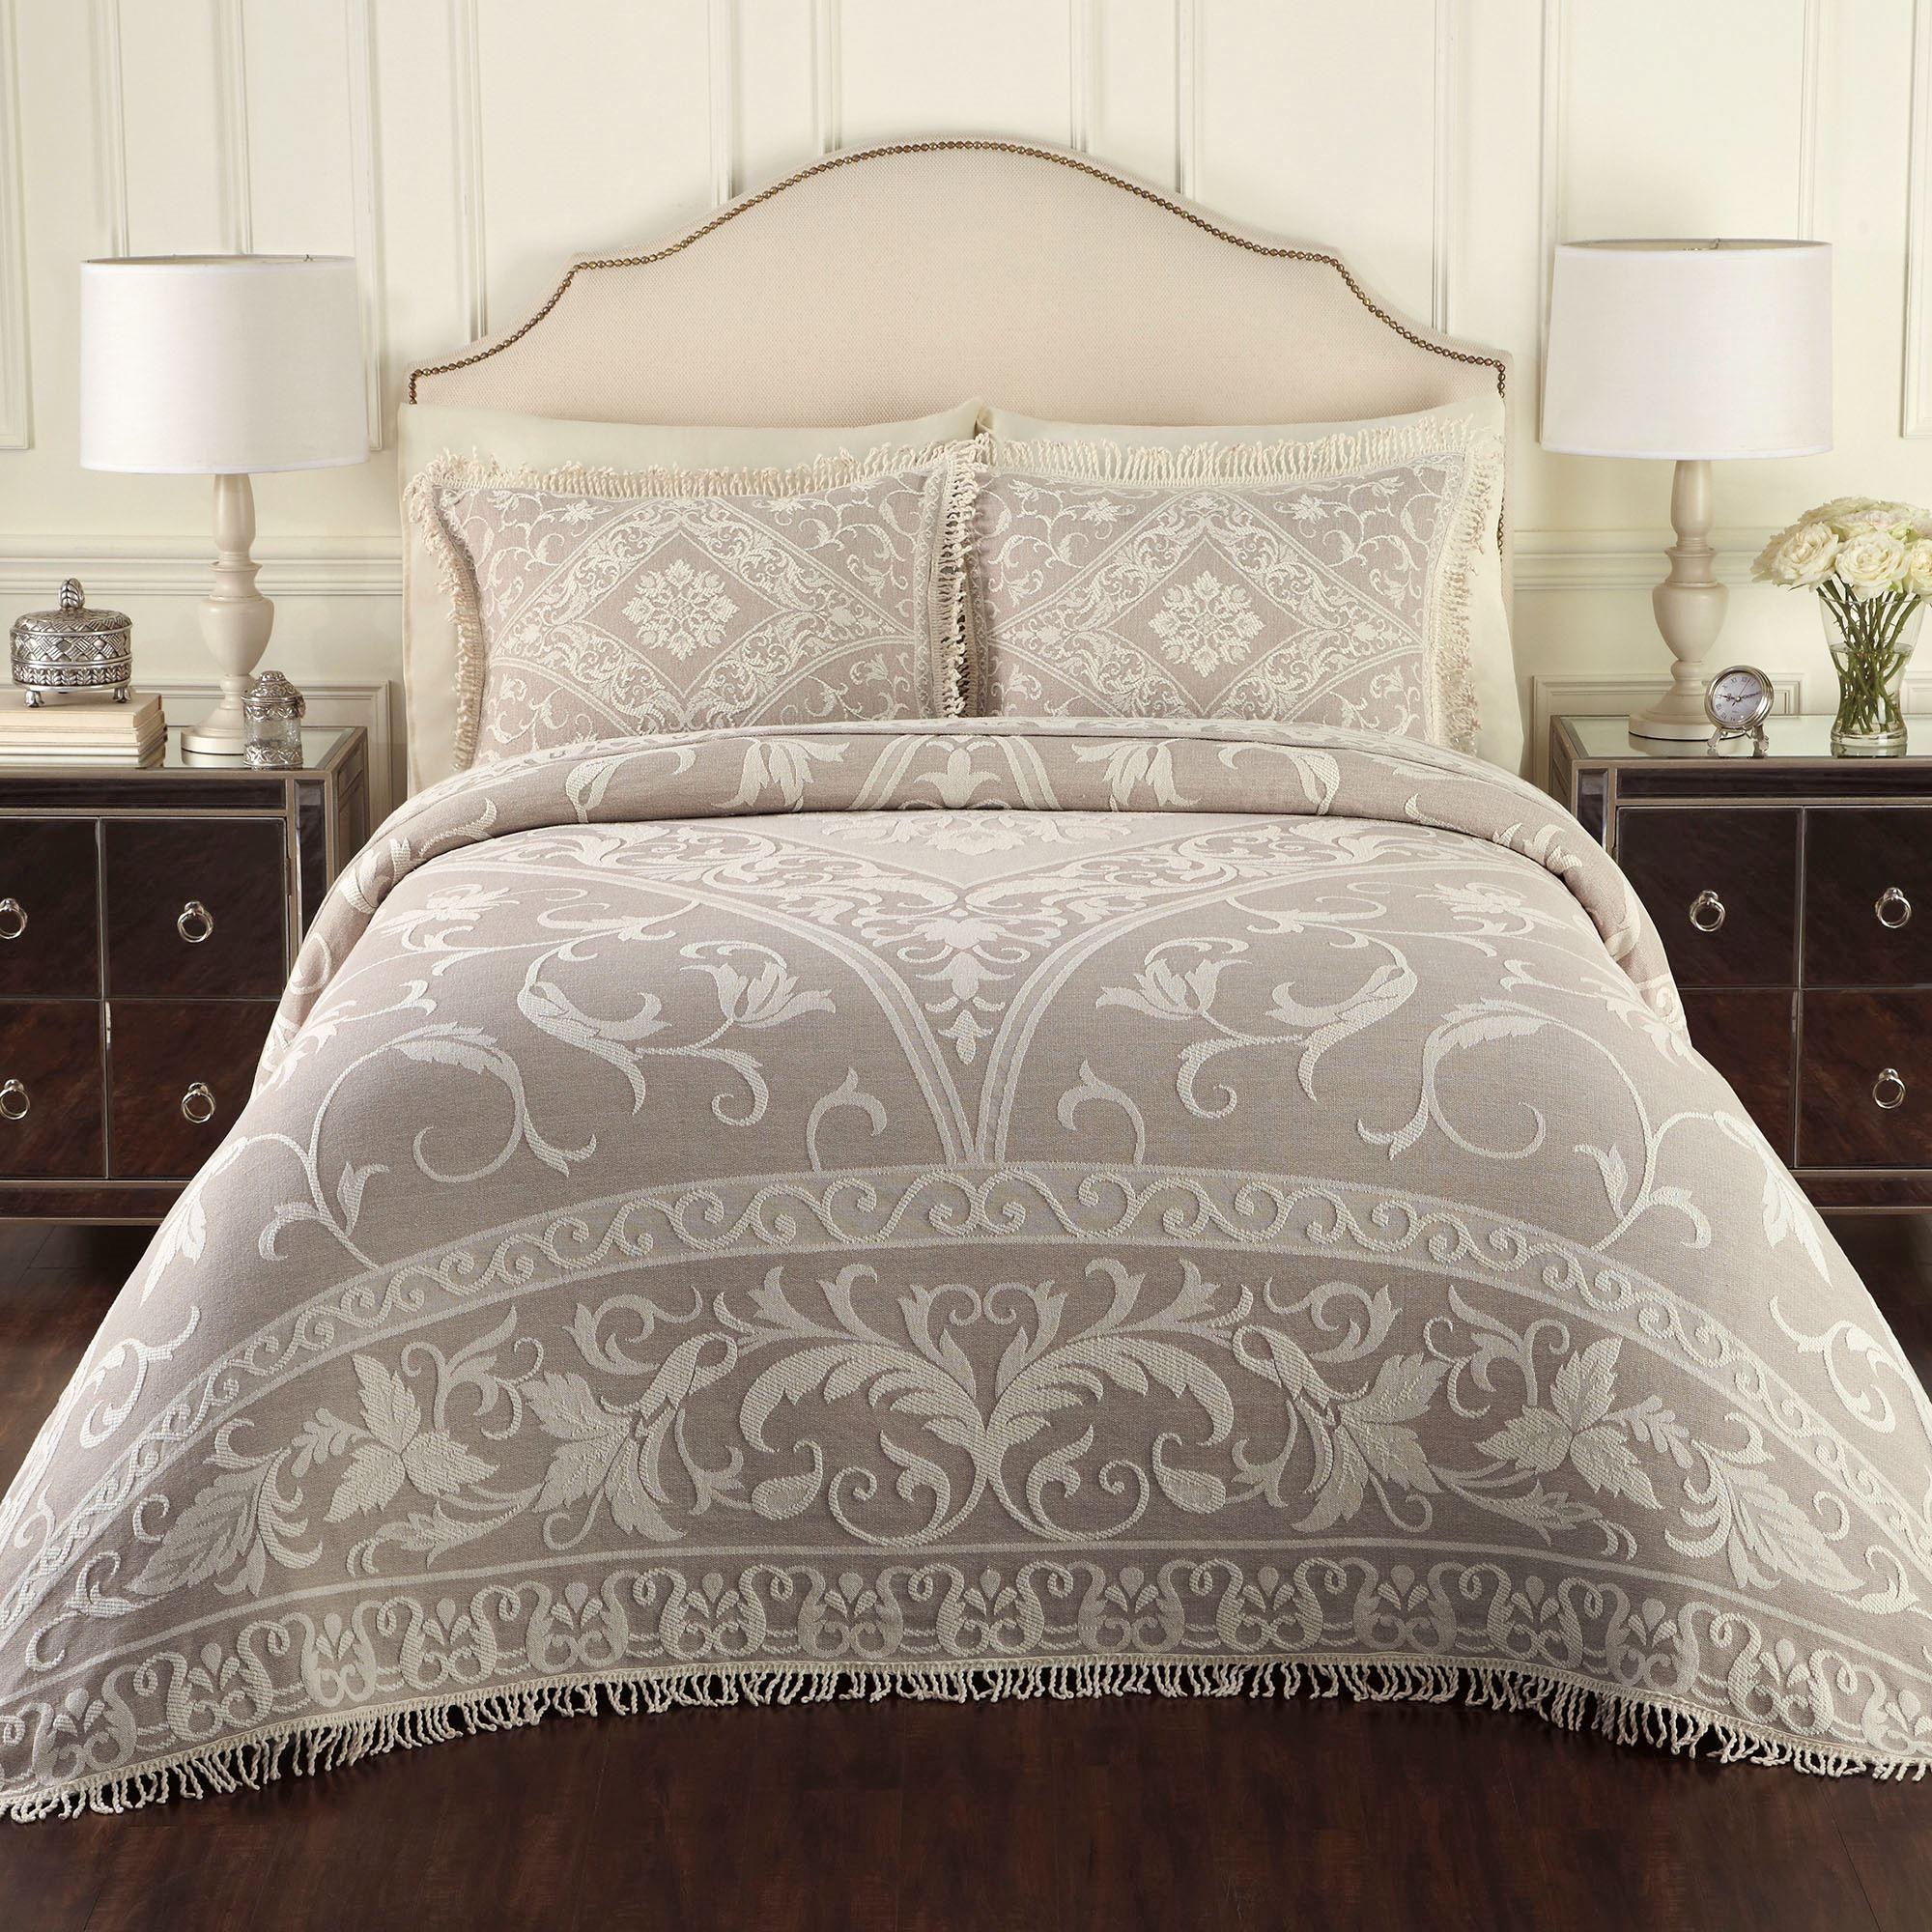 Gabriella Jacquard Woven Fringed Bedspread Bedding